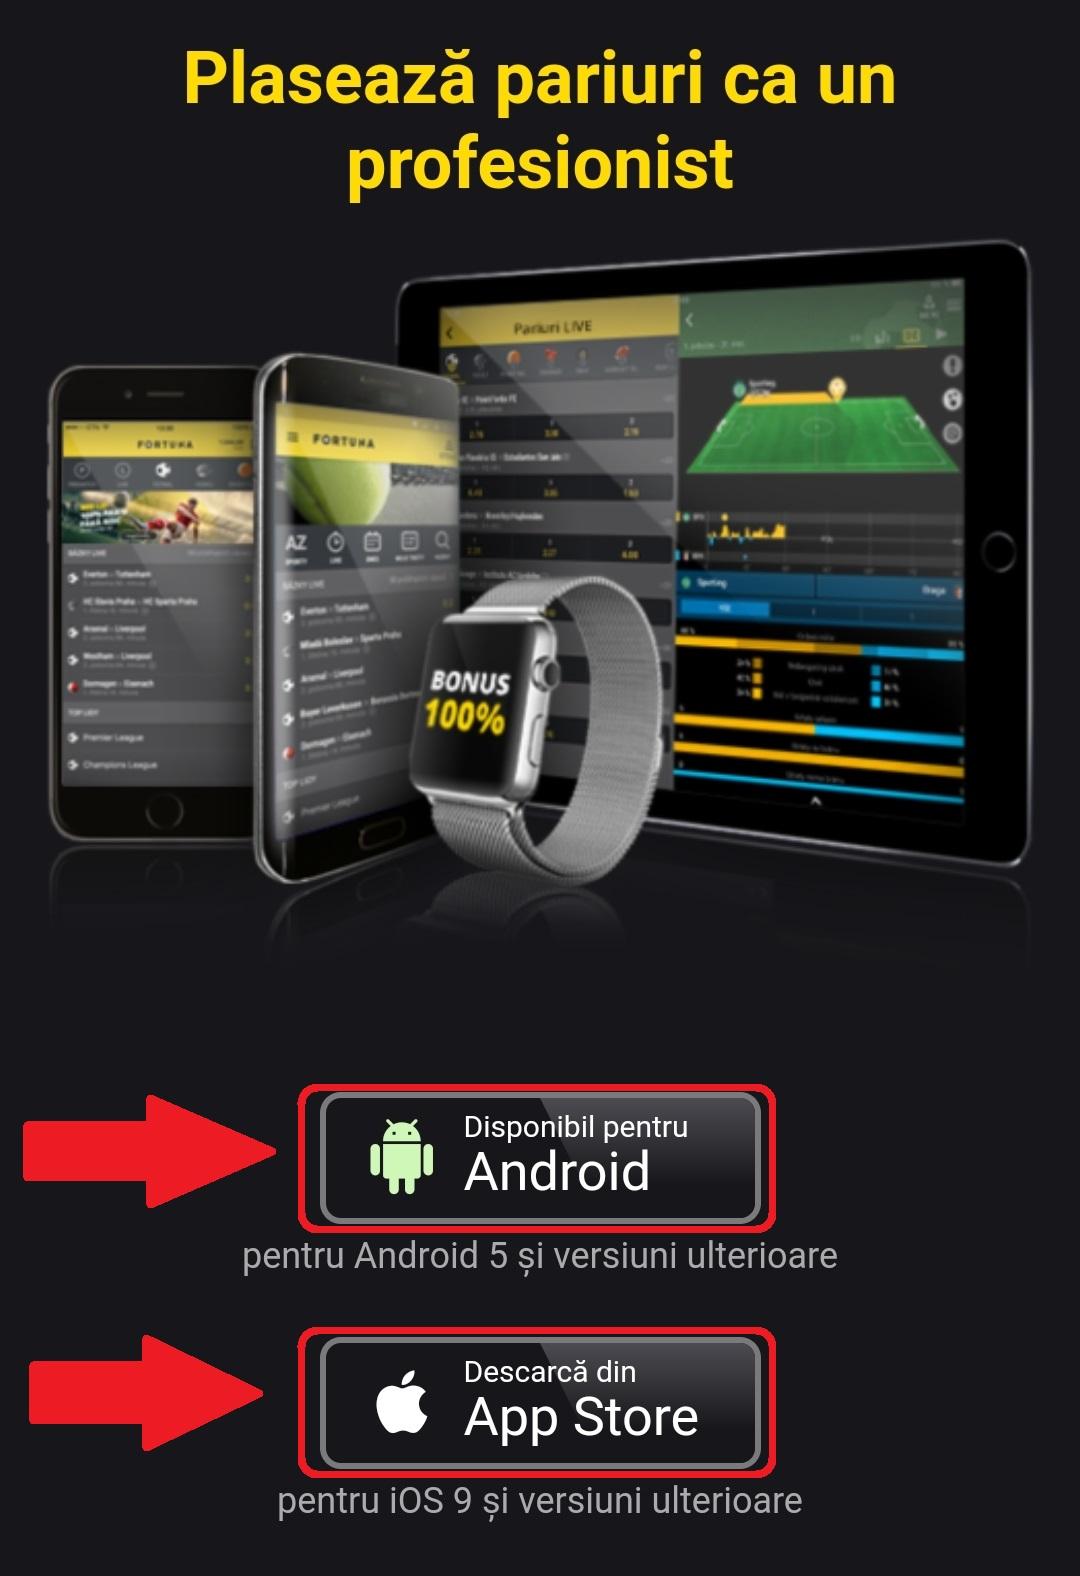 Fortuna download